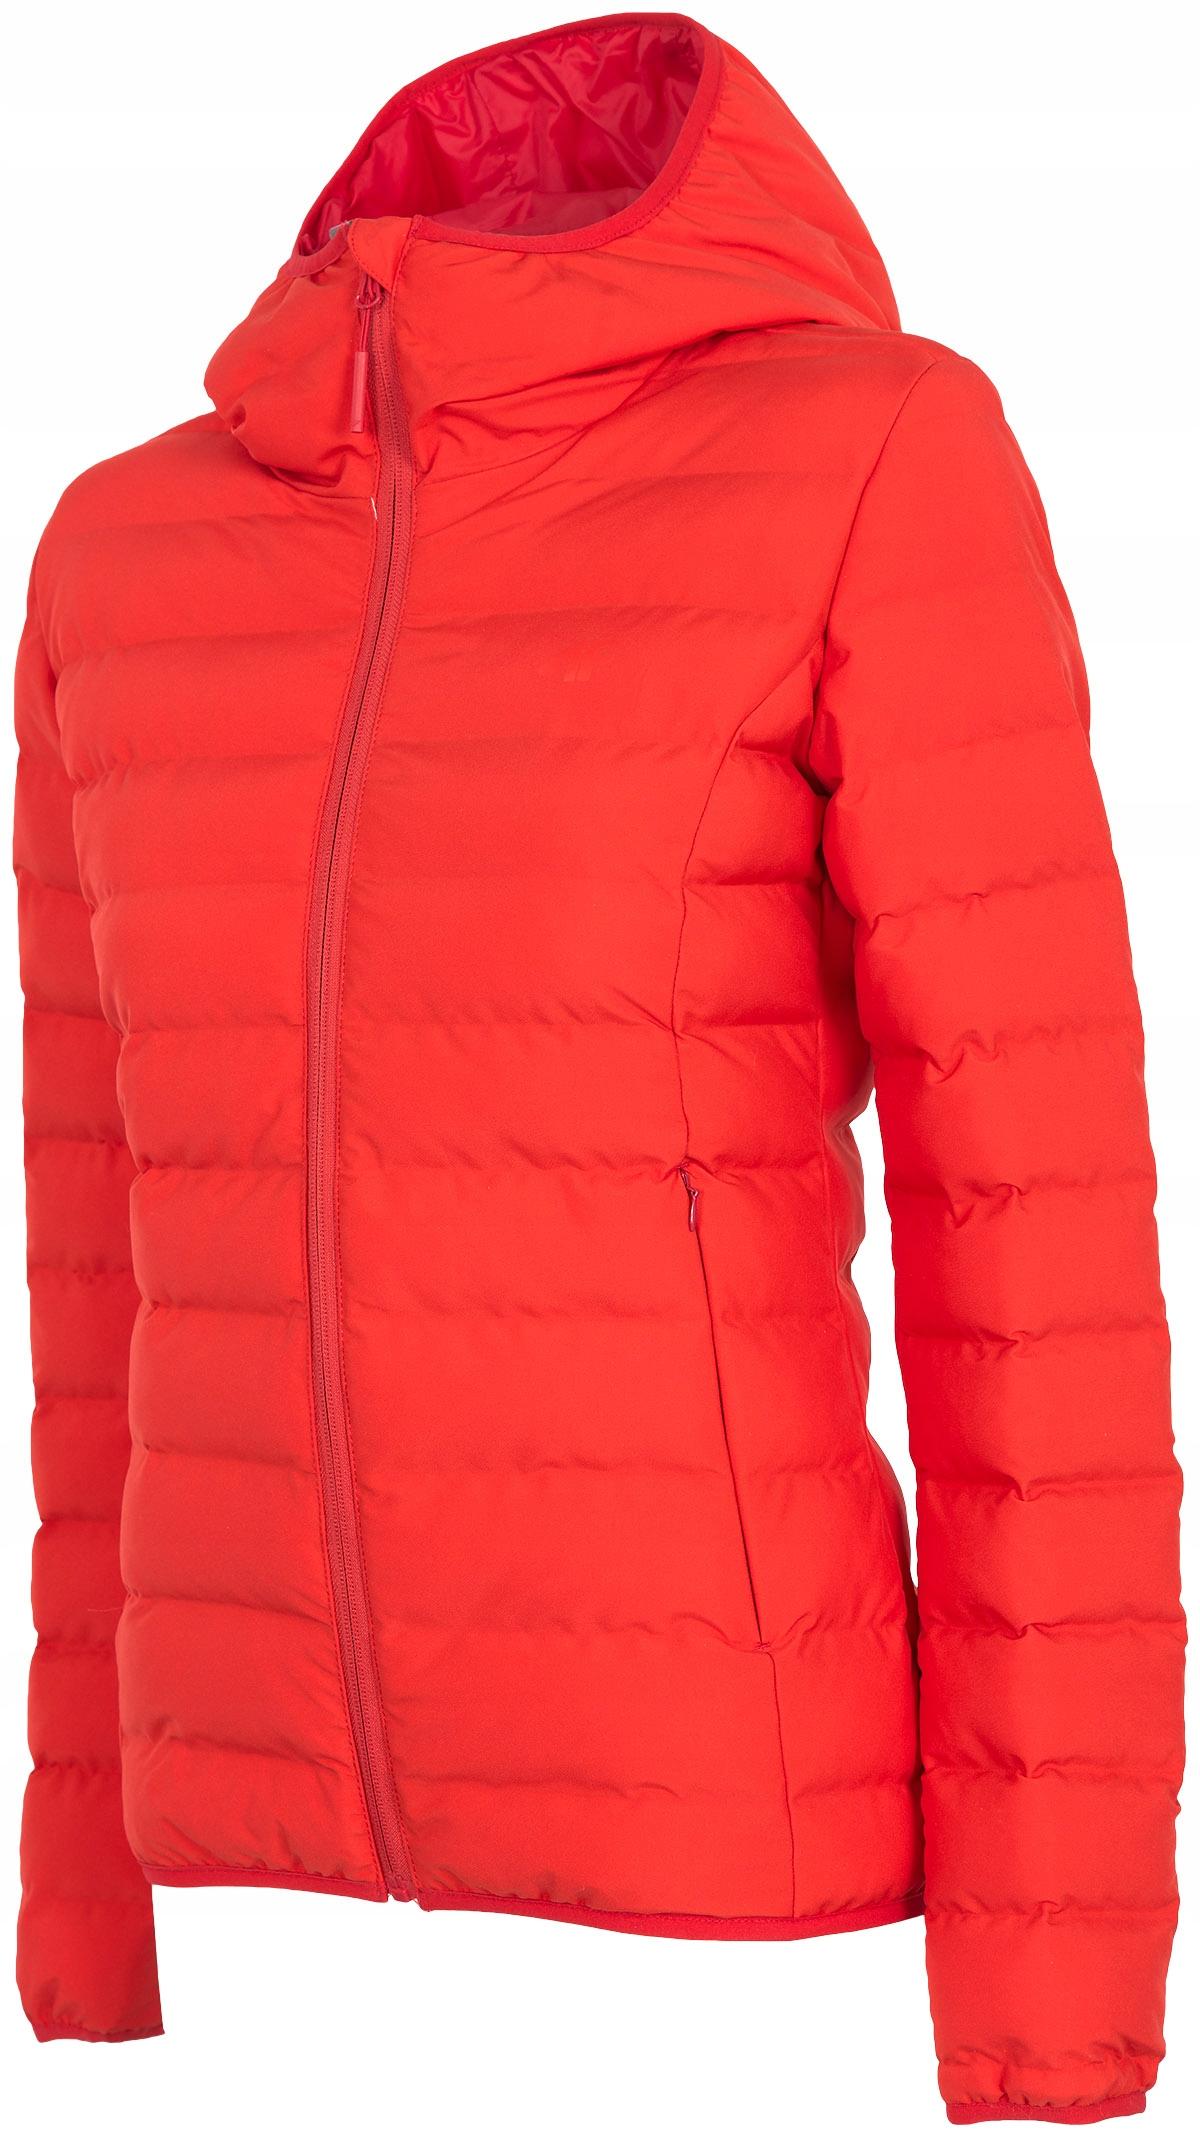 4F Damska kurtka puchowa 2019 KUDP006 czerwony XL